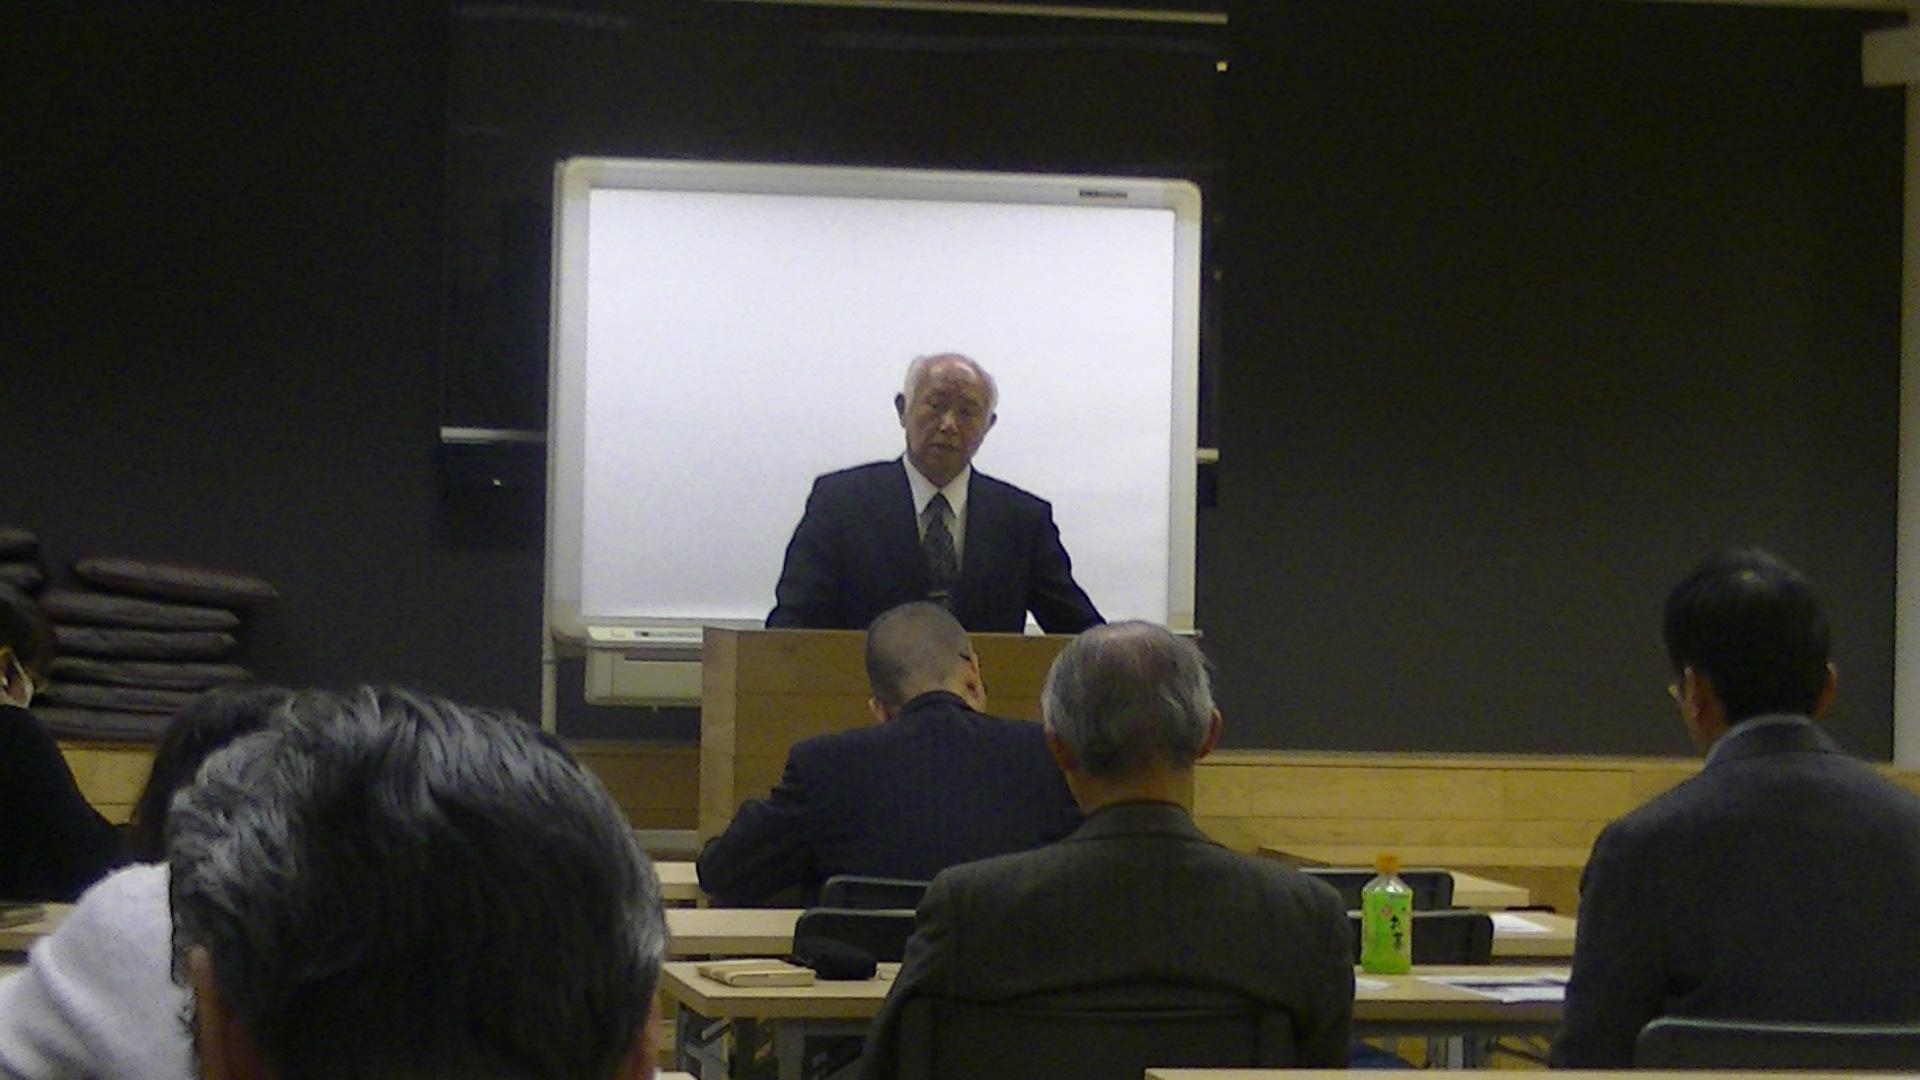 PIC 0095 - 4月1日東京思風塾の開催になります。